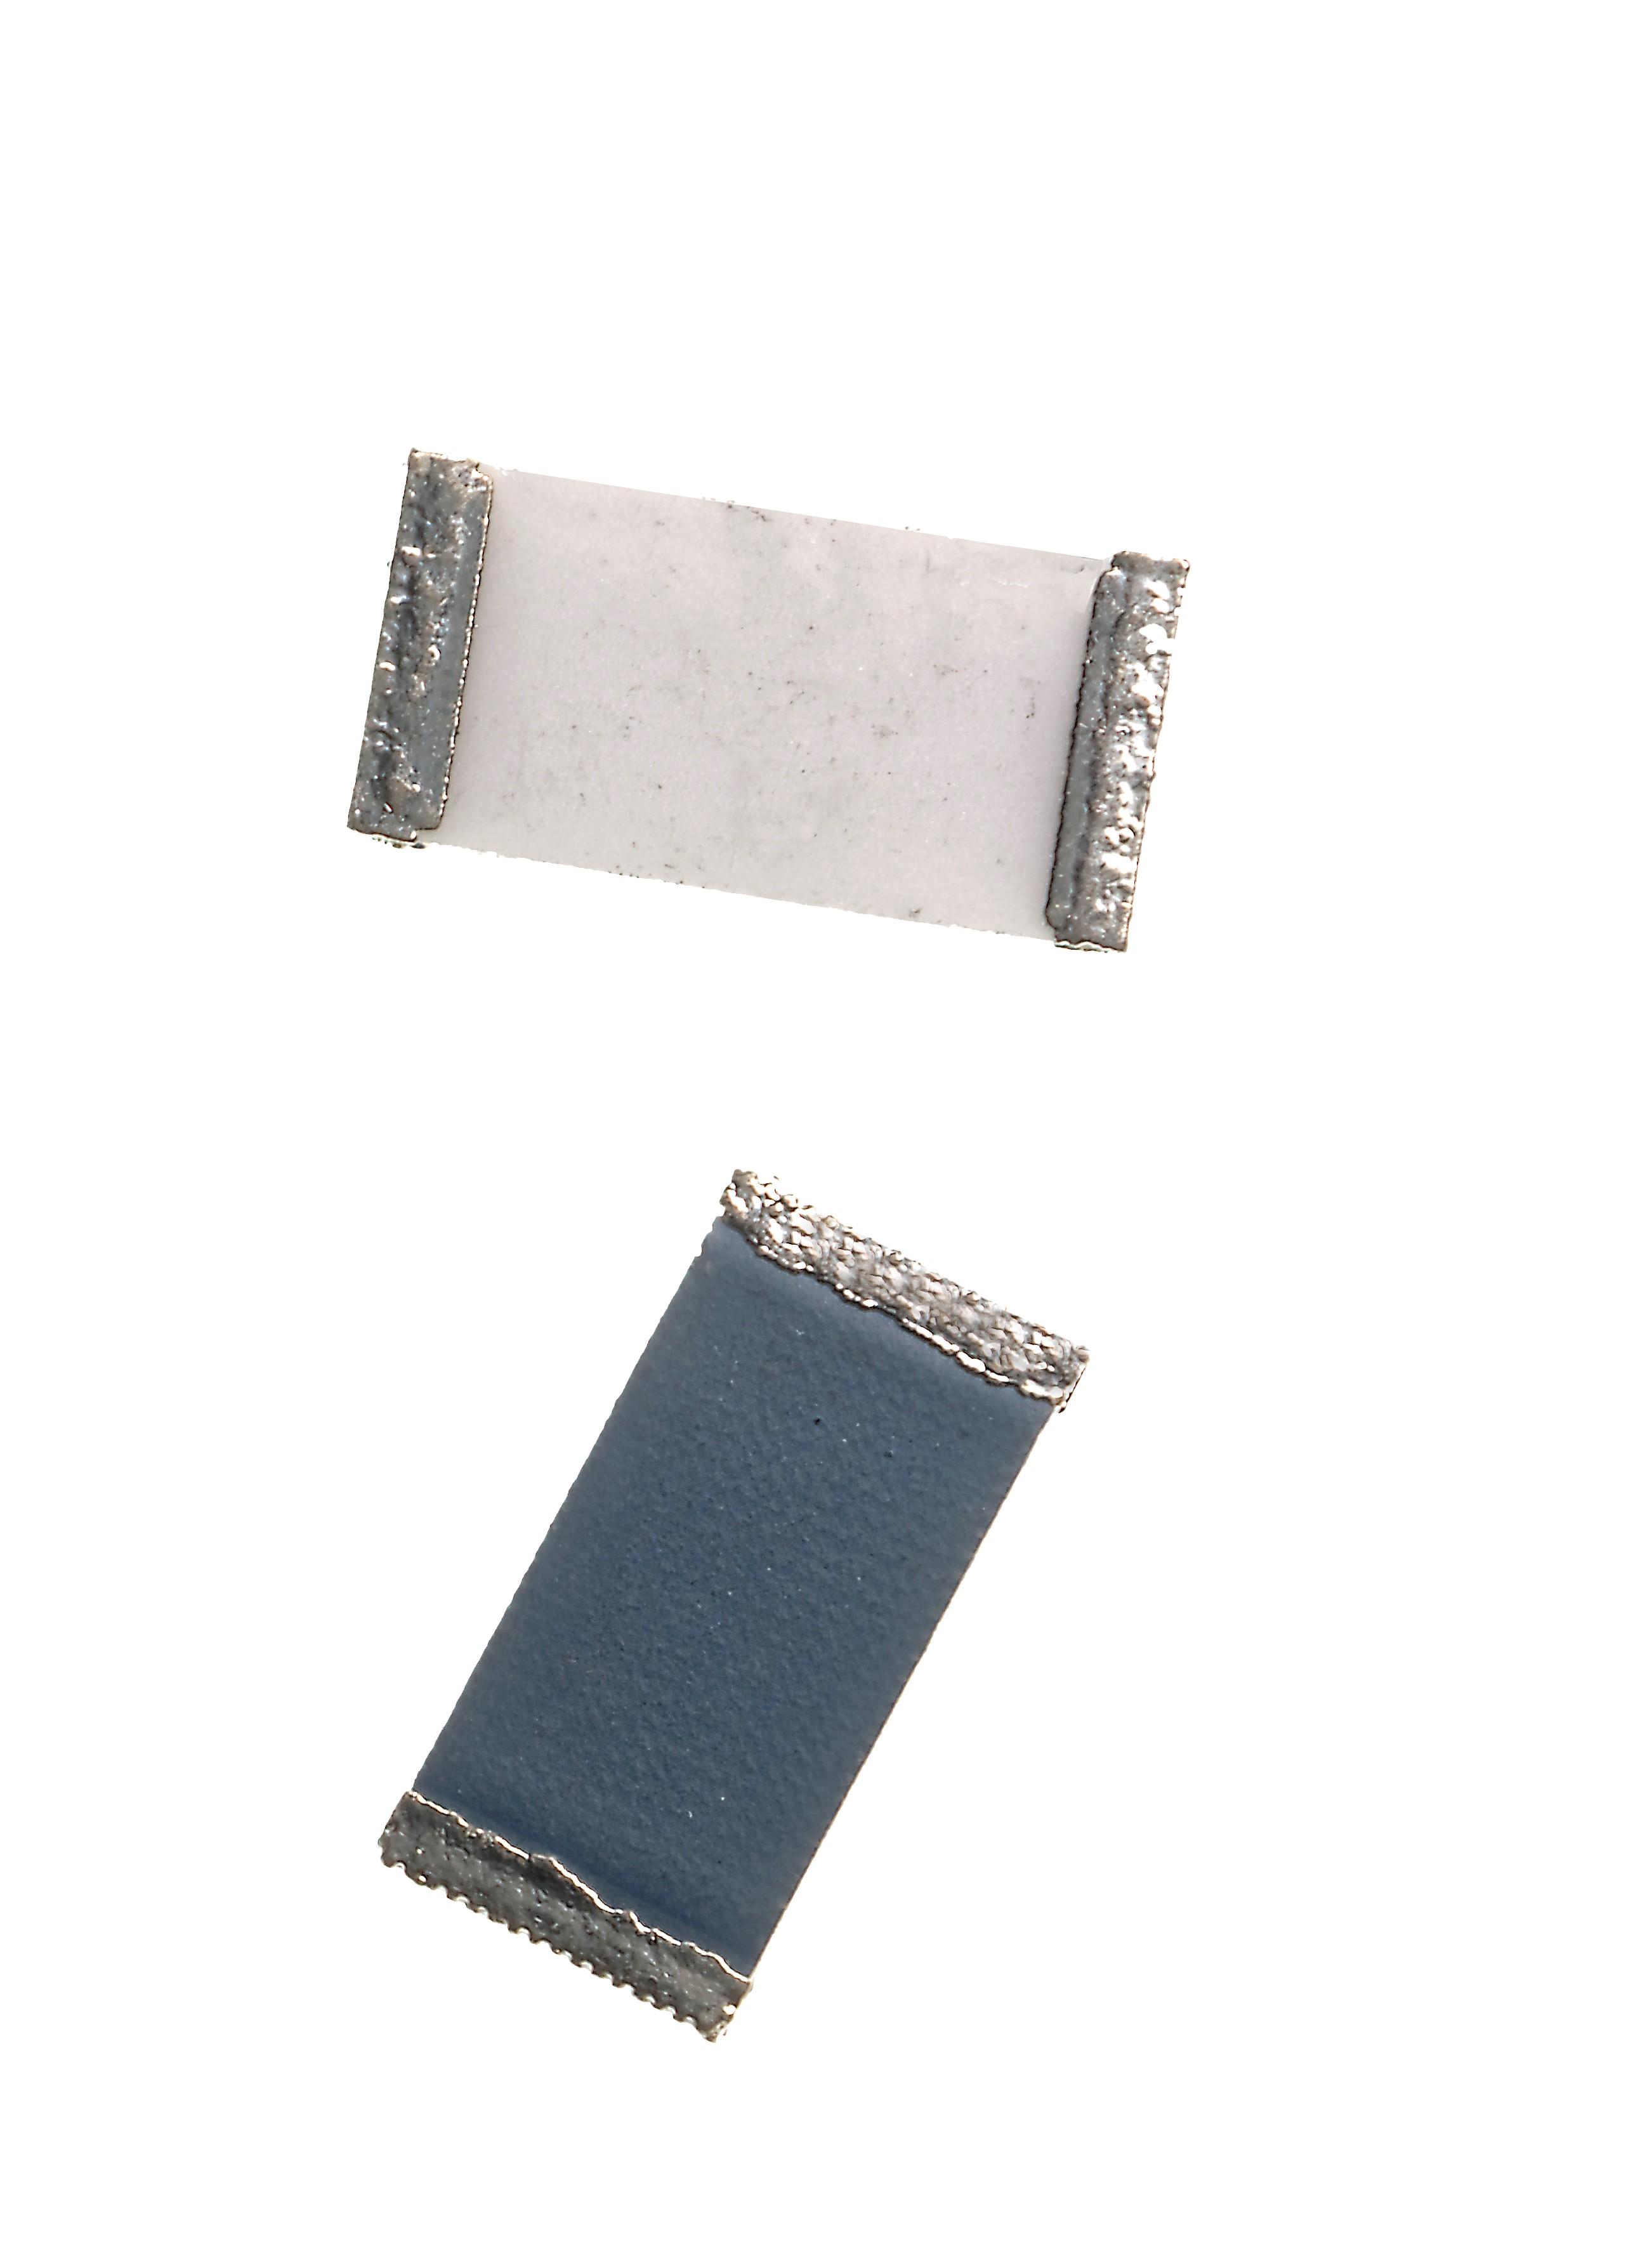 Tt Electronics Welwyn Resistor Range Authorised Distributor Ultra High Precision Resistors Ghvc Series Green Voltage Chip